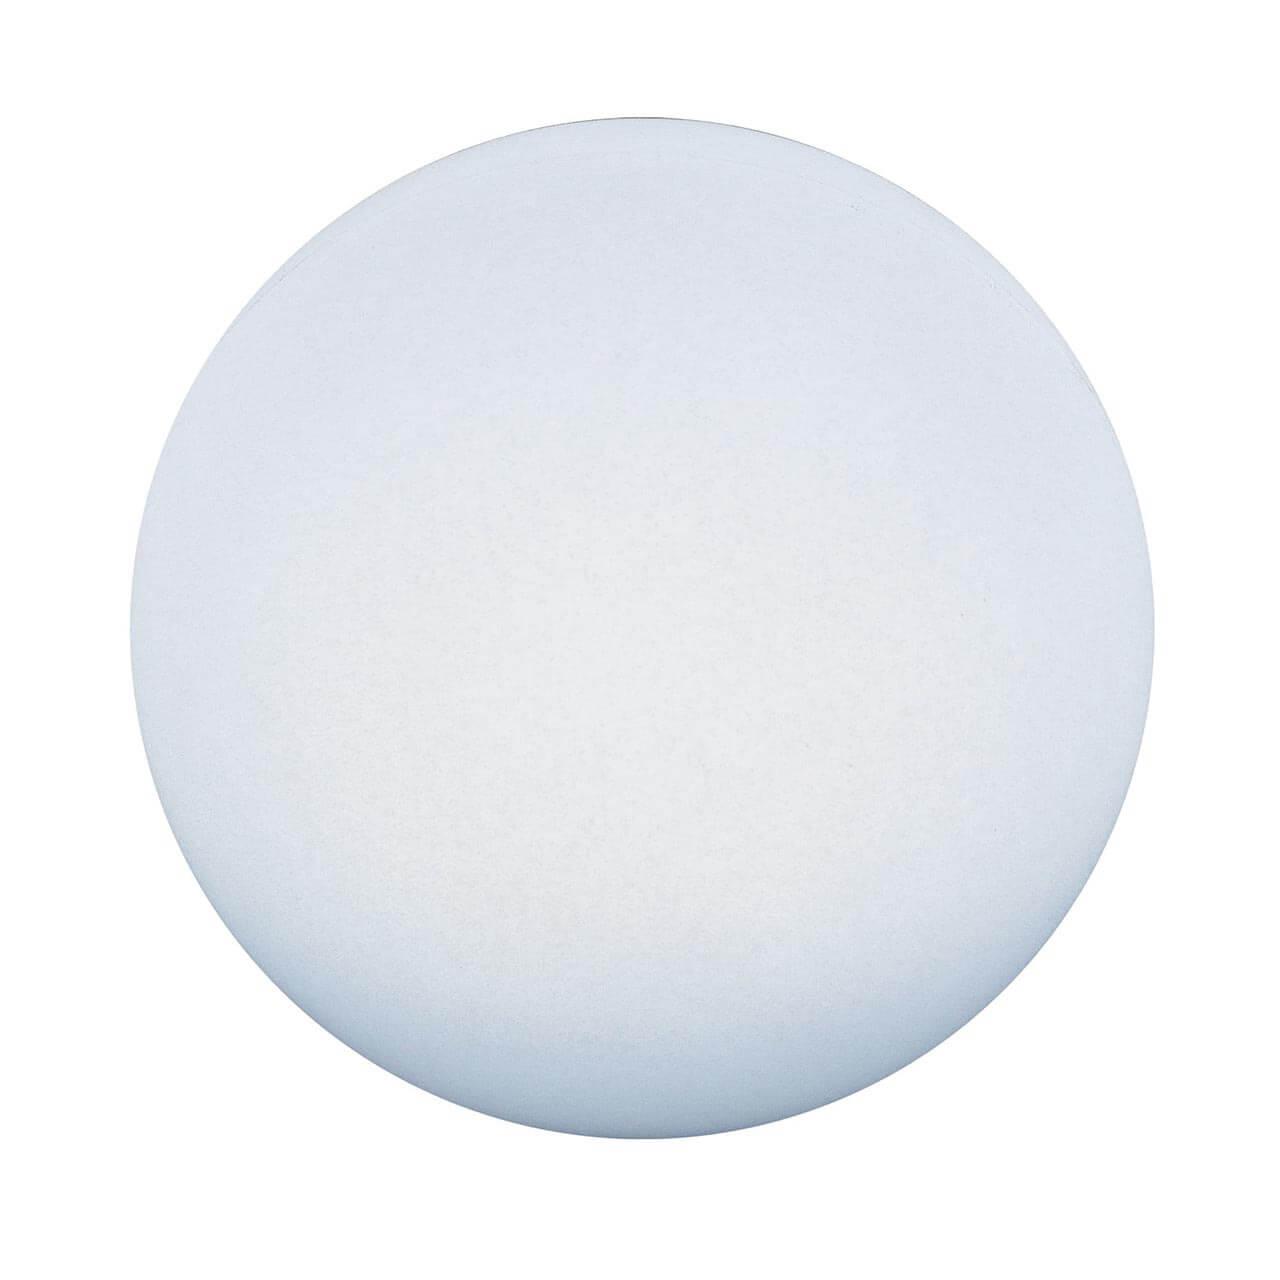 Светильник Uniel ULG-R001 030/RGB IP65 Ball ULV-R уличный светодиодный светильник ul 00003301 uniel ulg r001 020 rgb ip65 ball